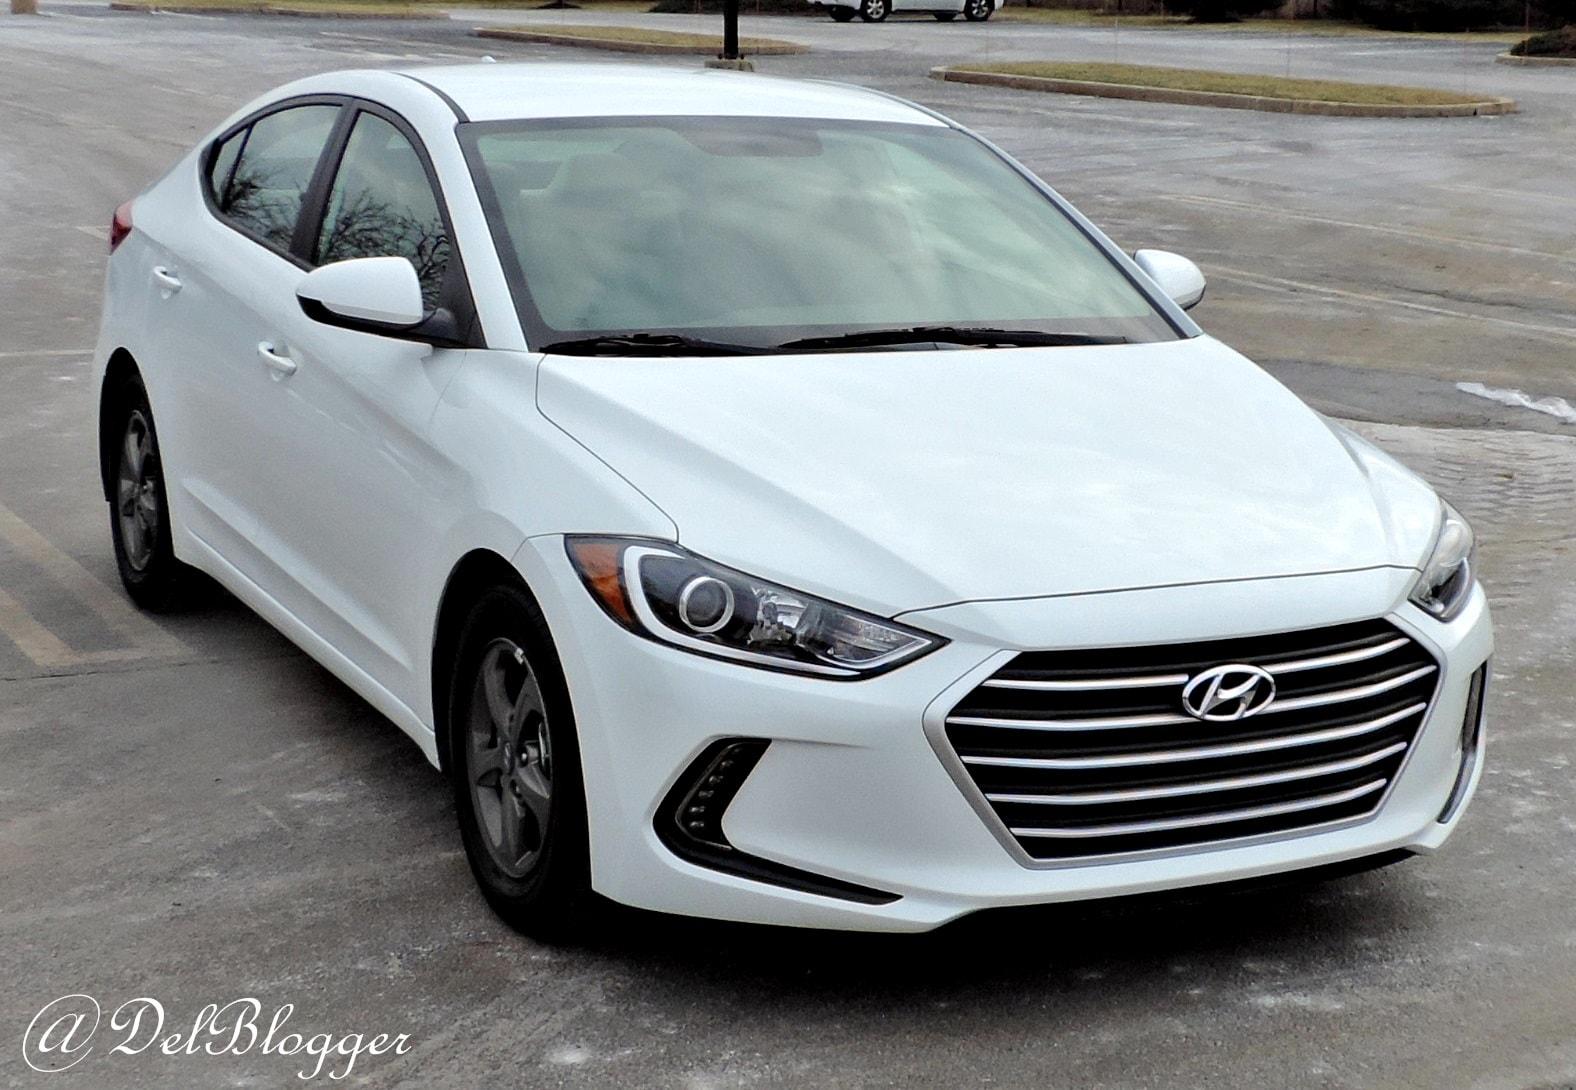 2018-Hyundai-Elantra-Eco-Features